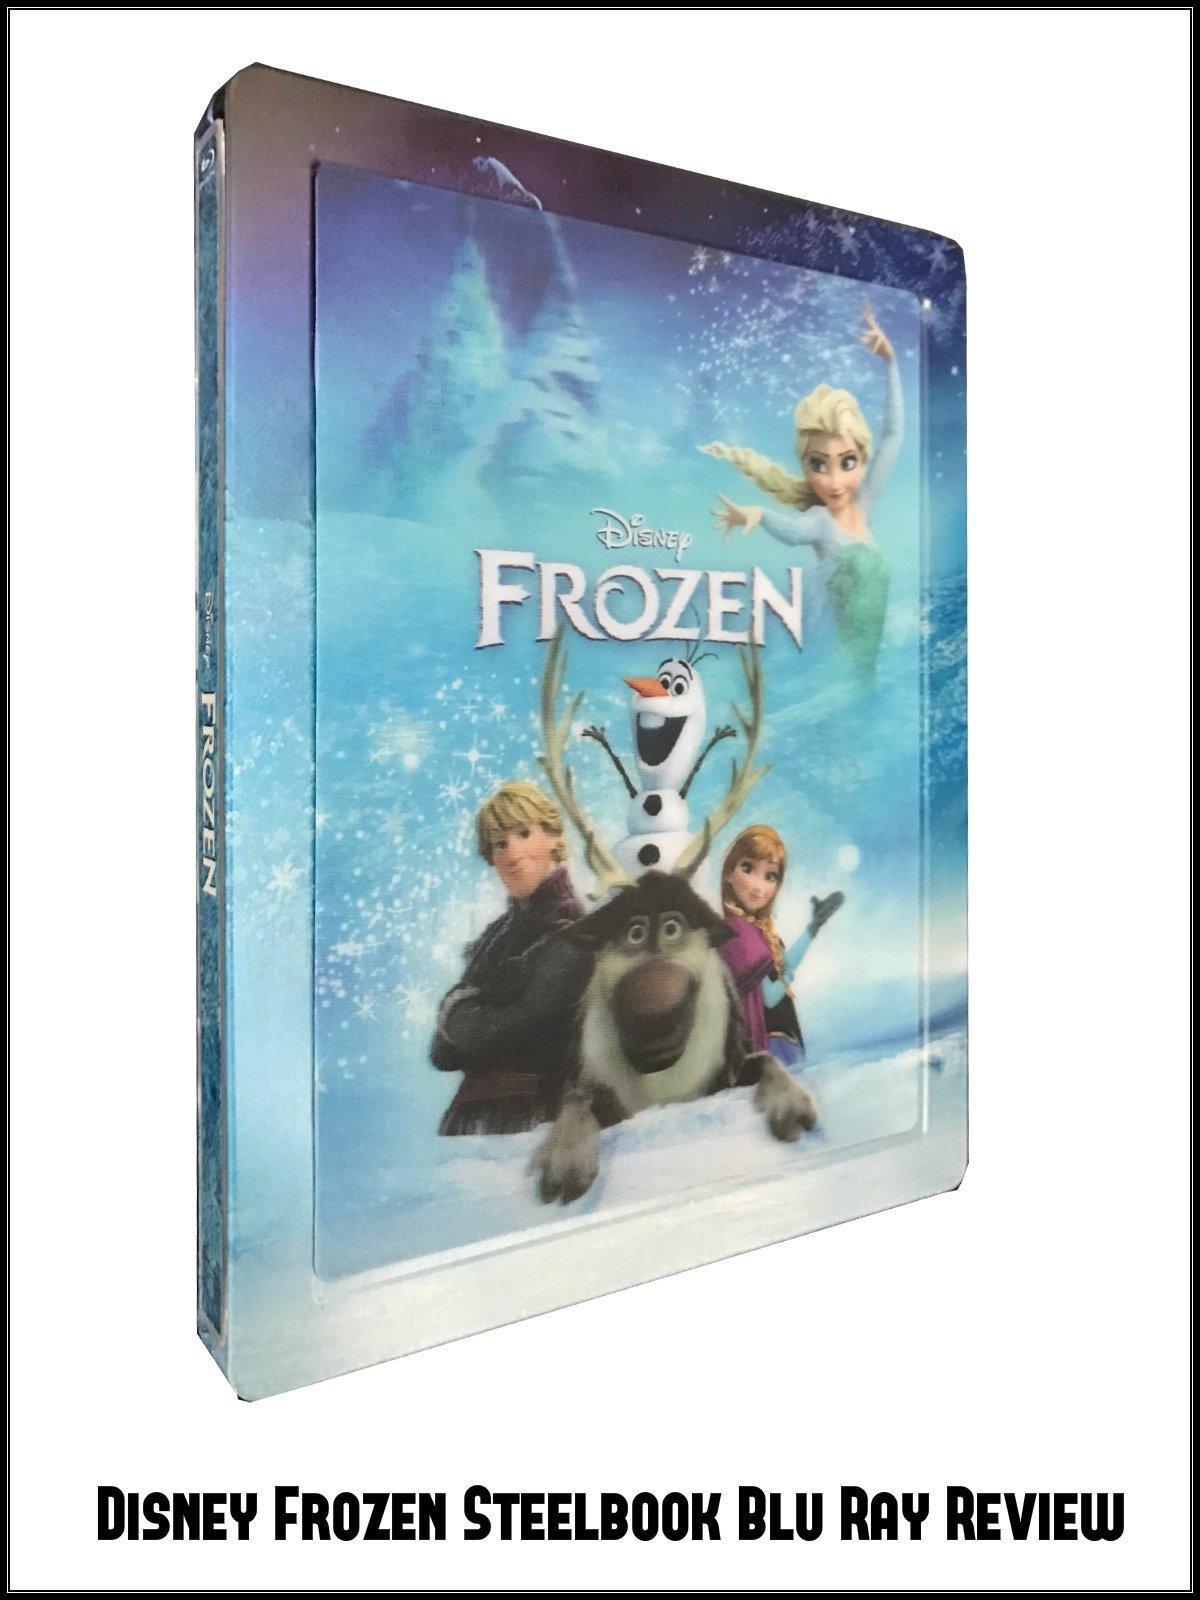 Review: Disney Frozen Steelbook Blu Ray Review